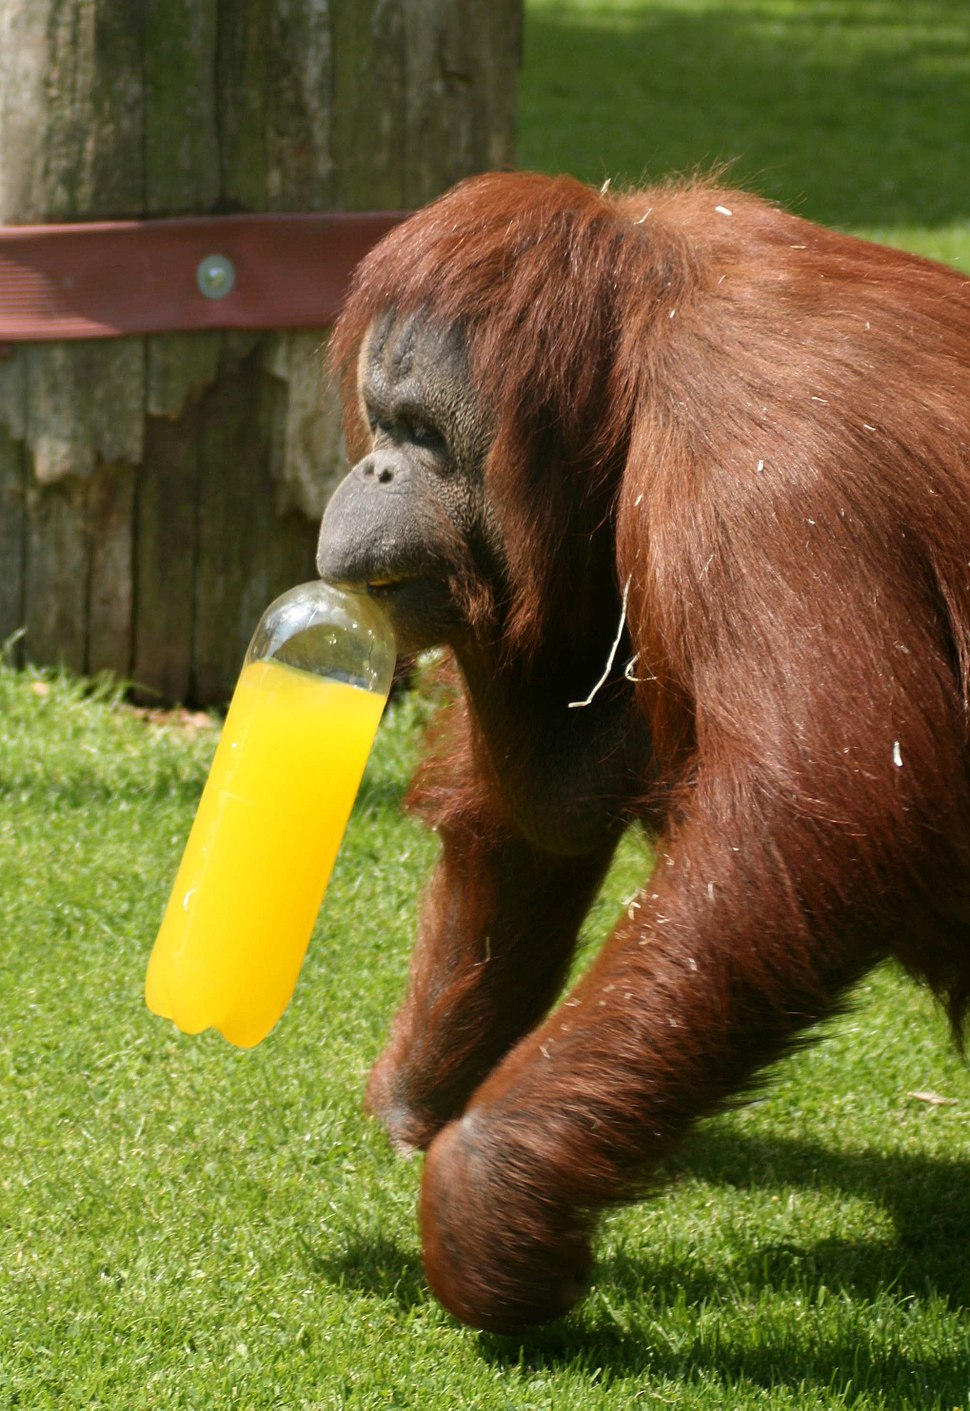 Orangutan (Pongo pygmaeus) at Twycross Zoo-4